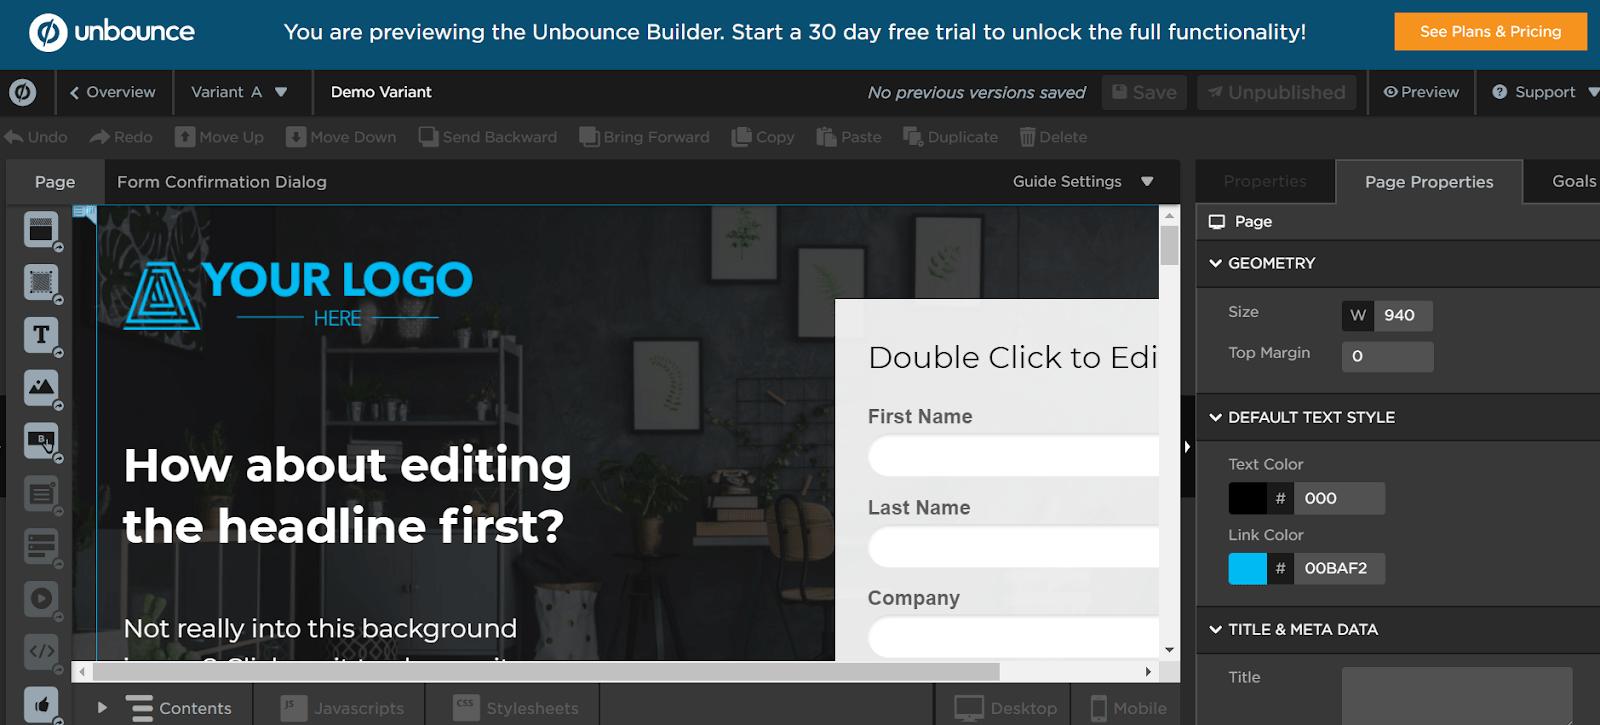 Unbounce B2B Marketing Tools